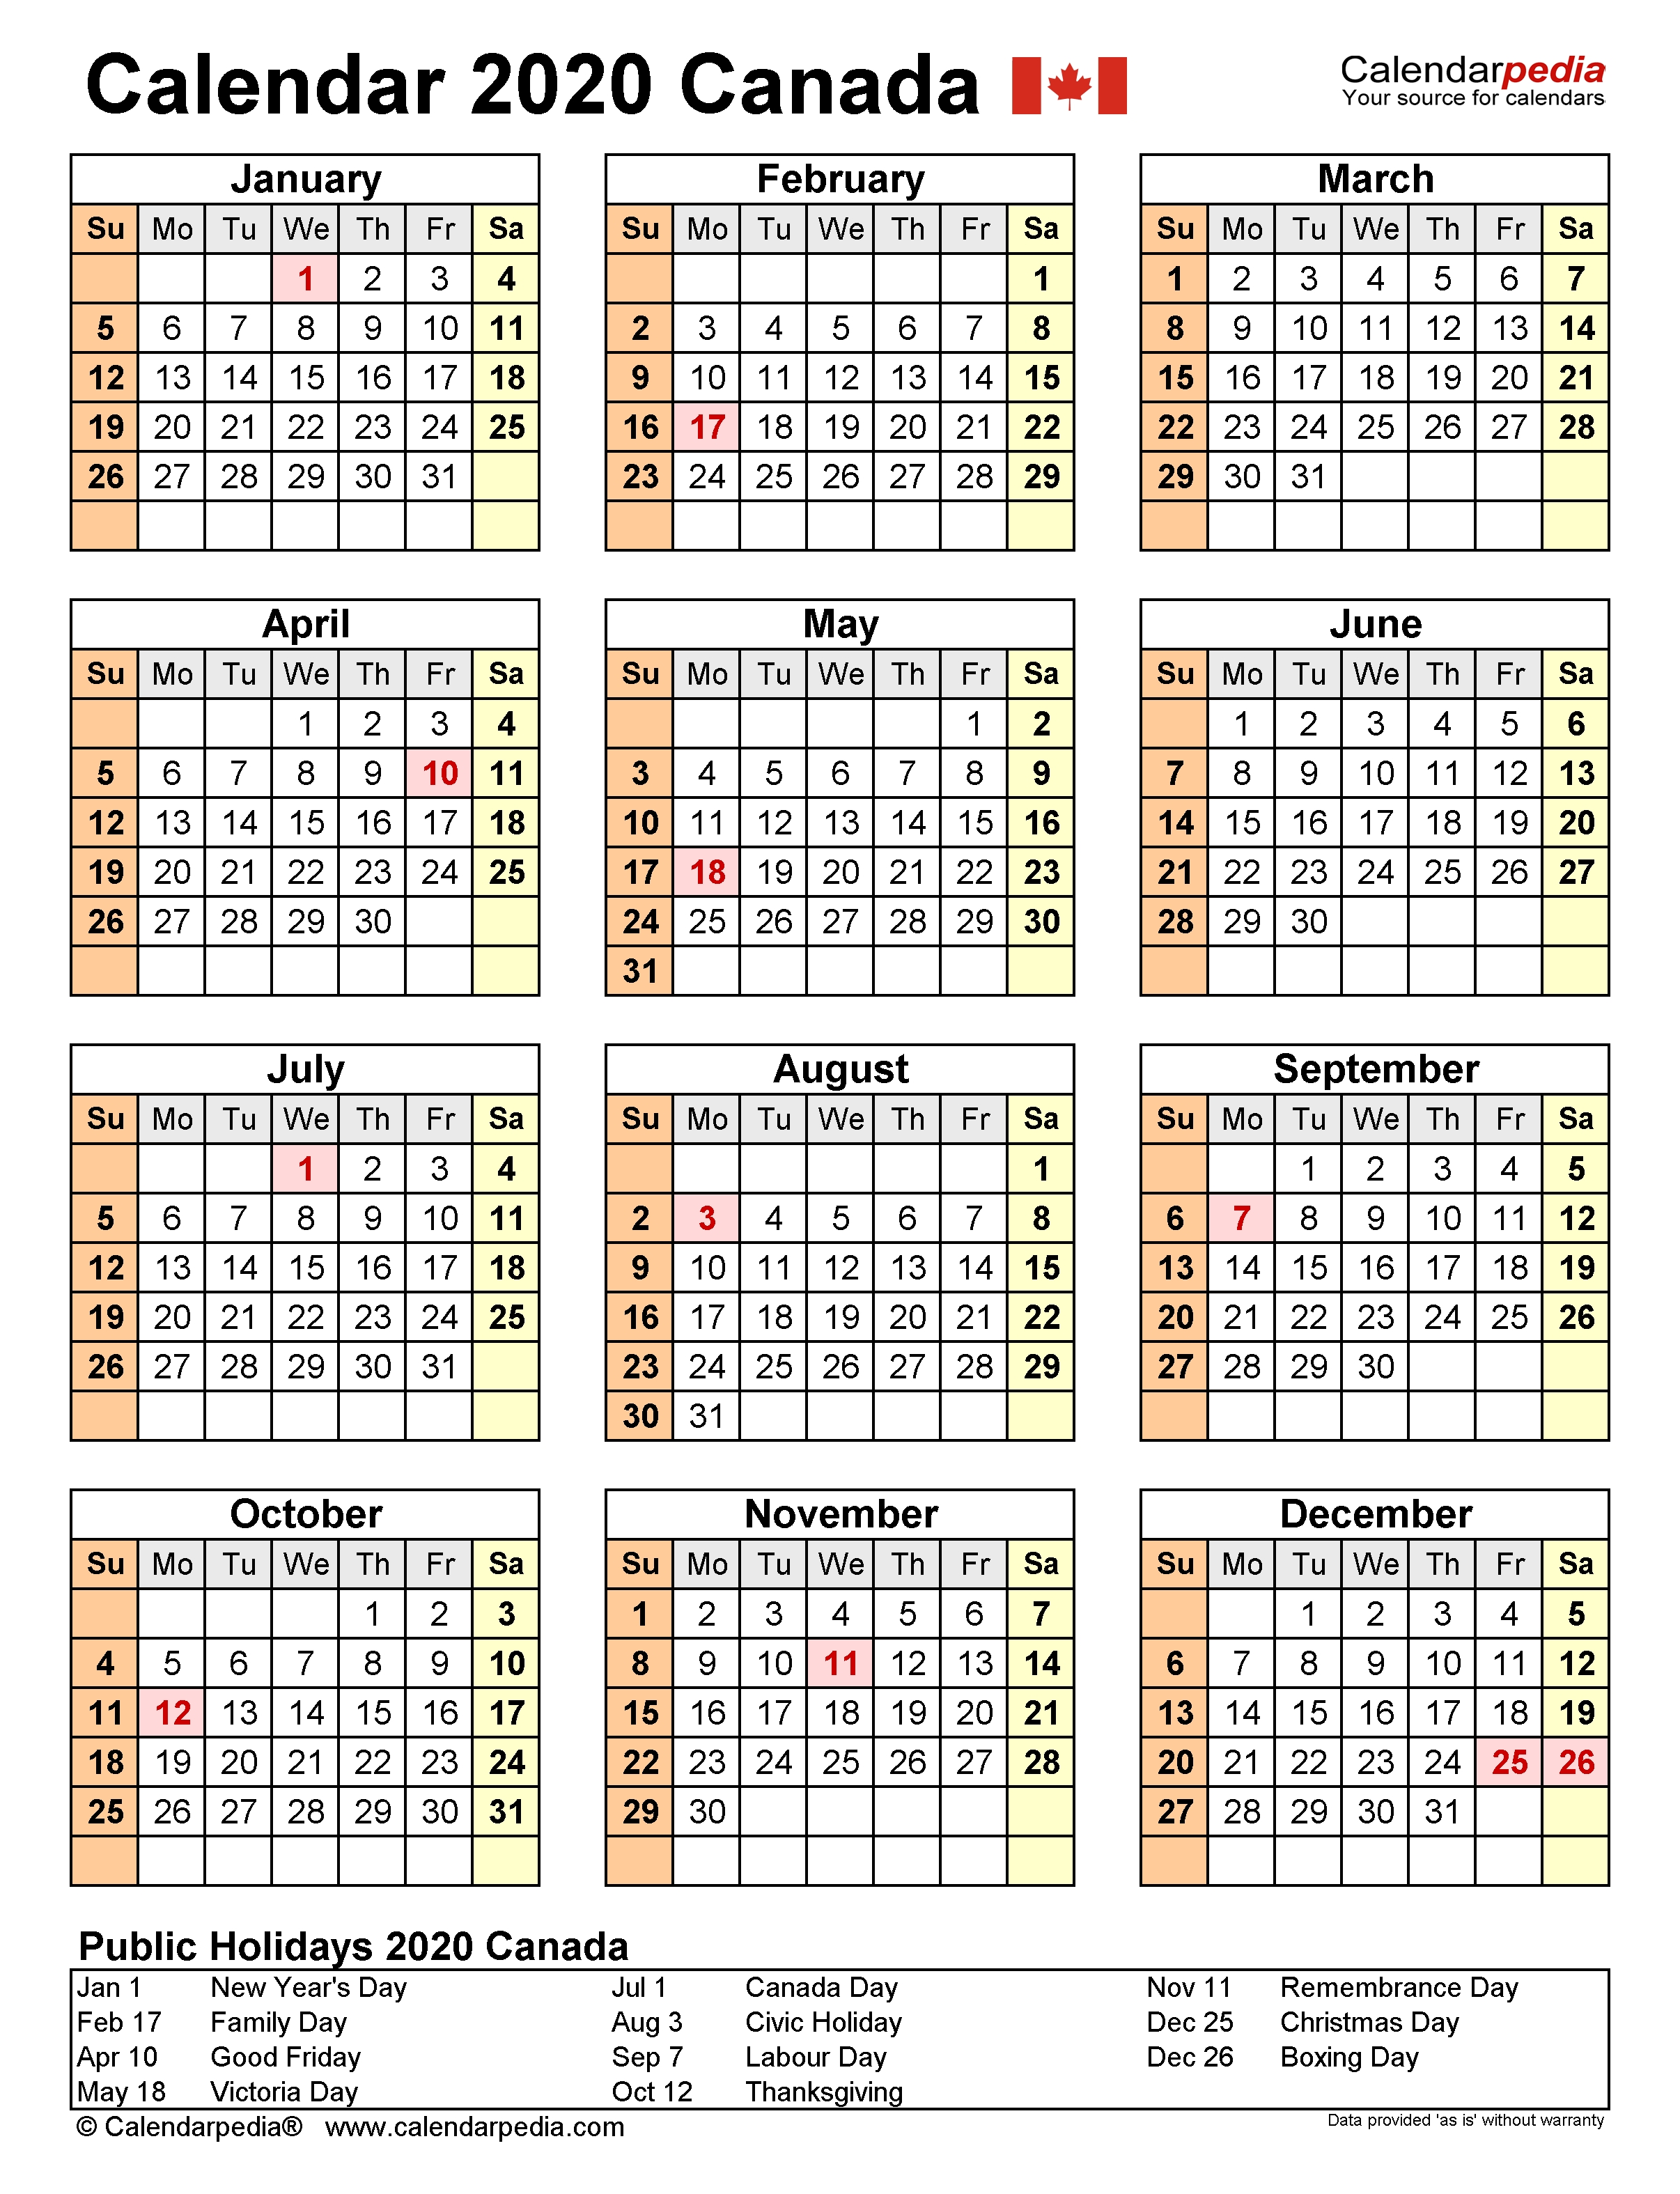 Canada Calendar 2020 - Free Printable Word Templates